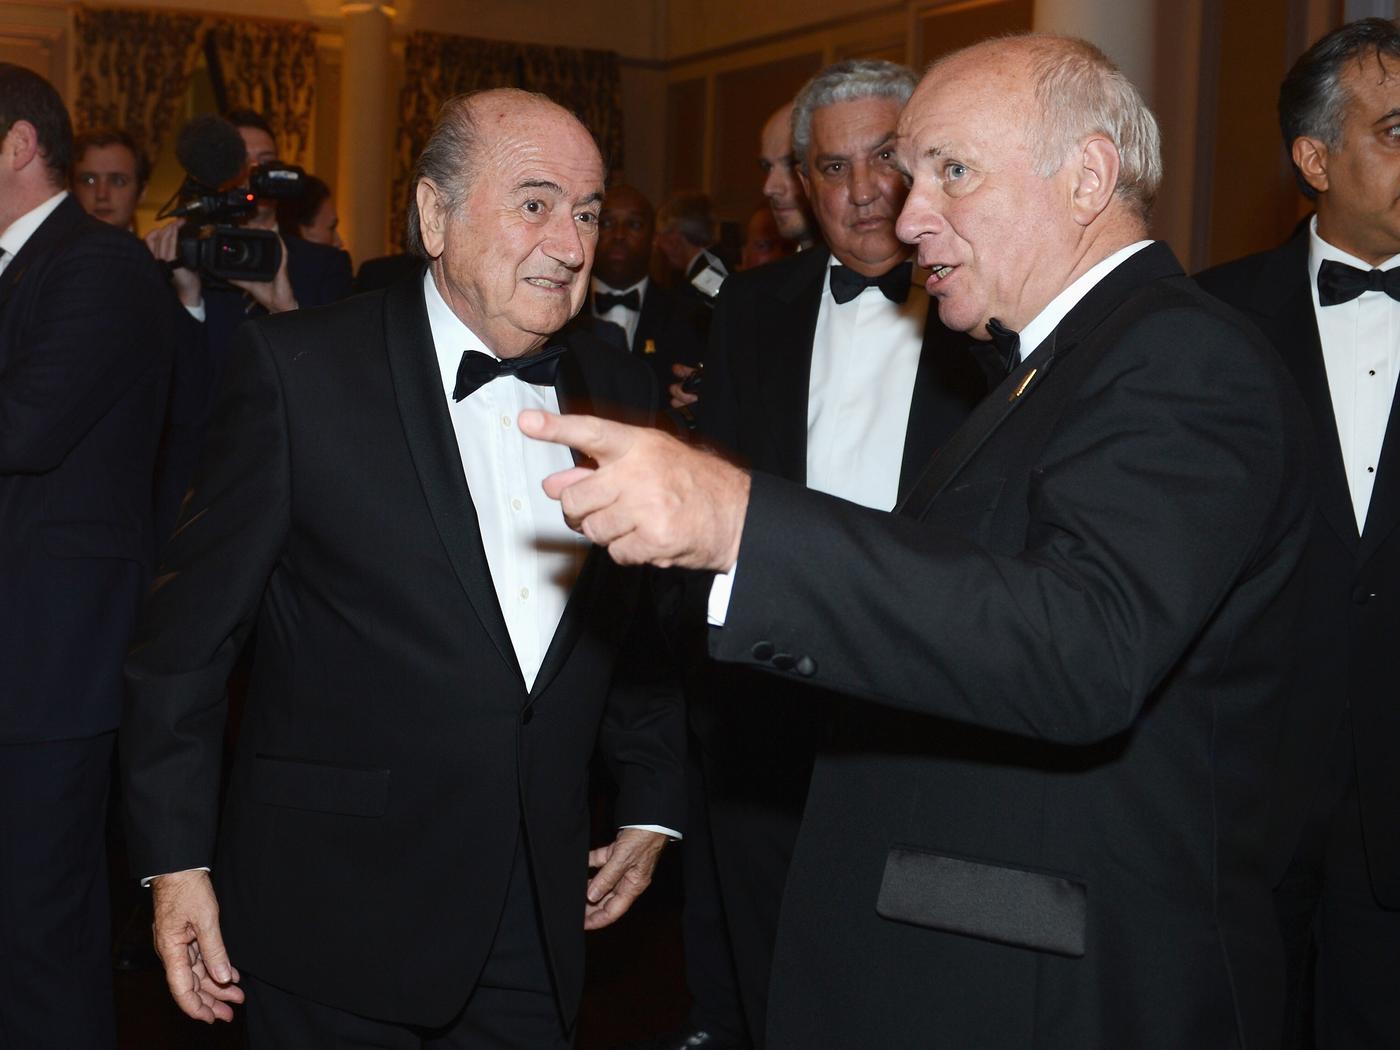 FA chairman Greg Dyke claims Fifa president Sepp Blatter has always disliked him and the English